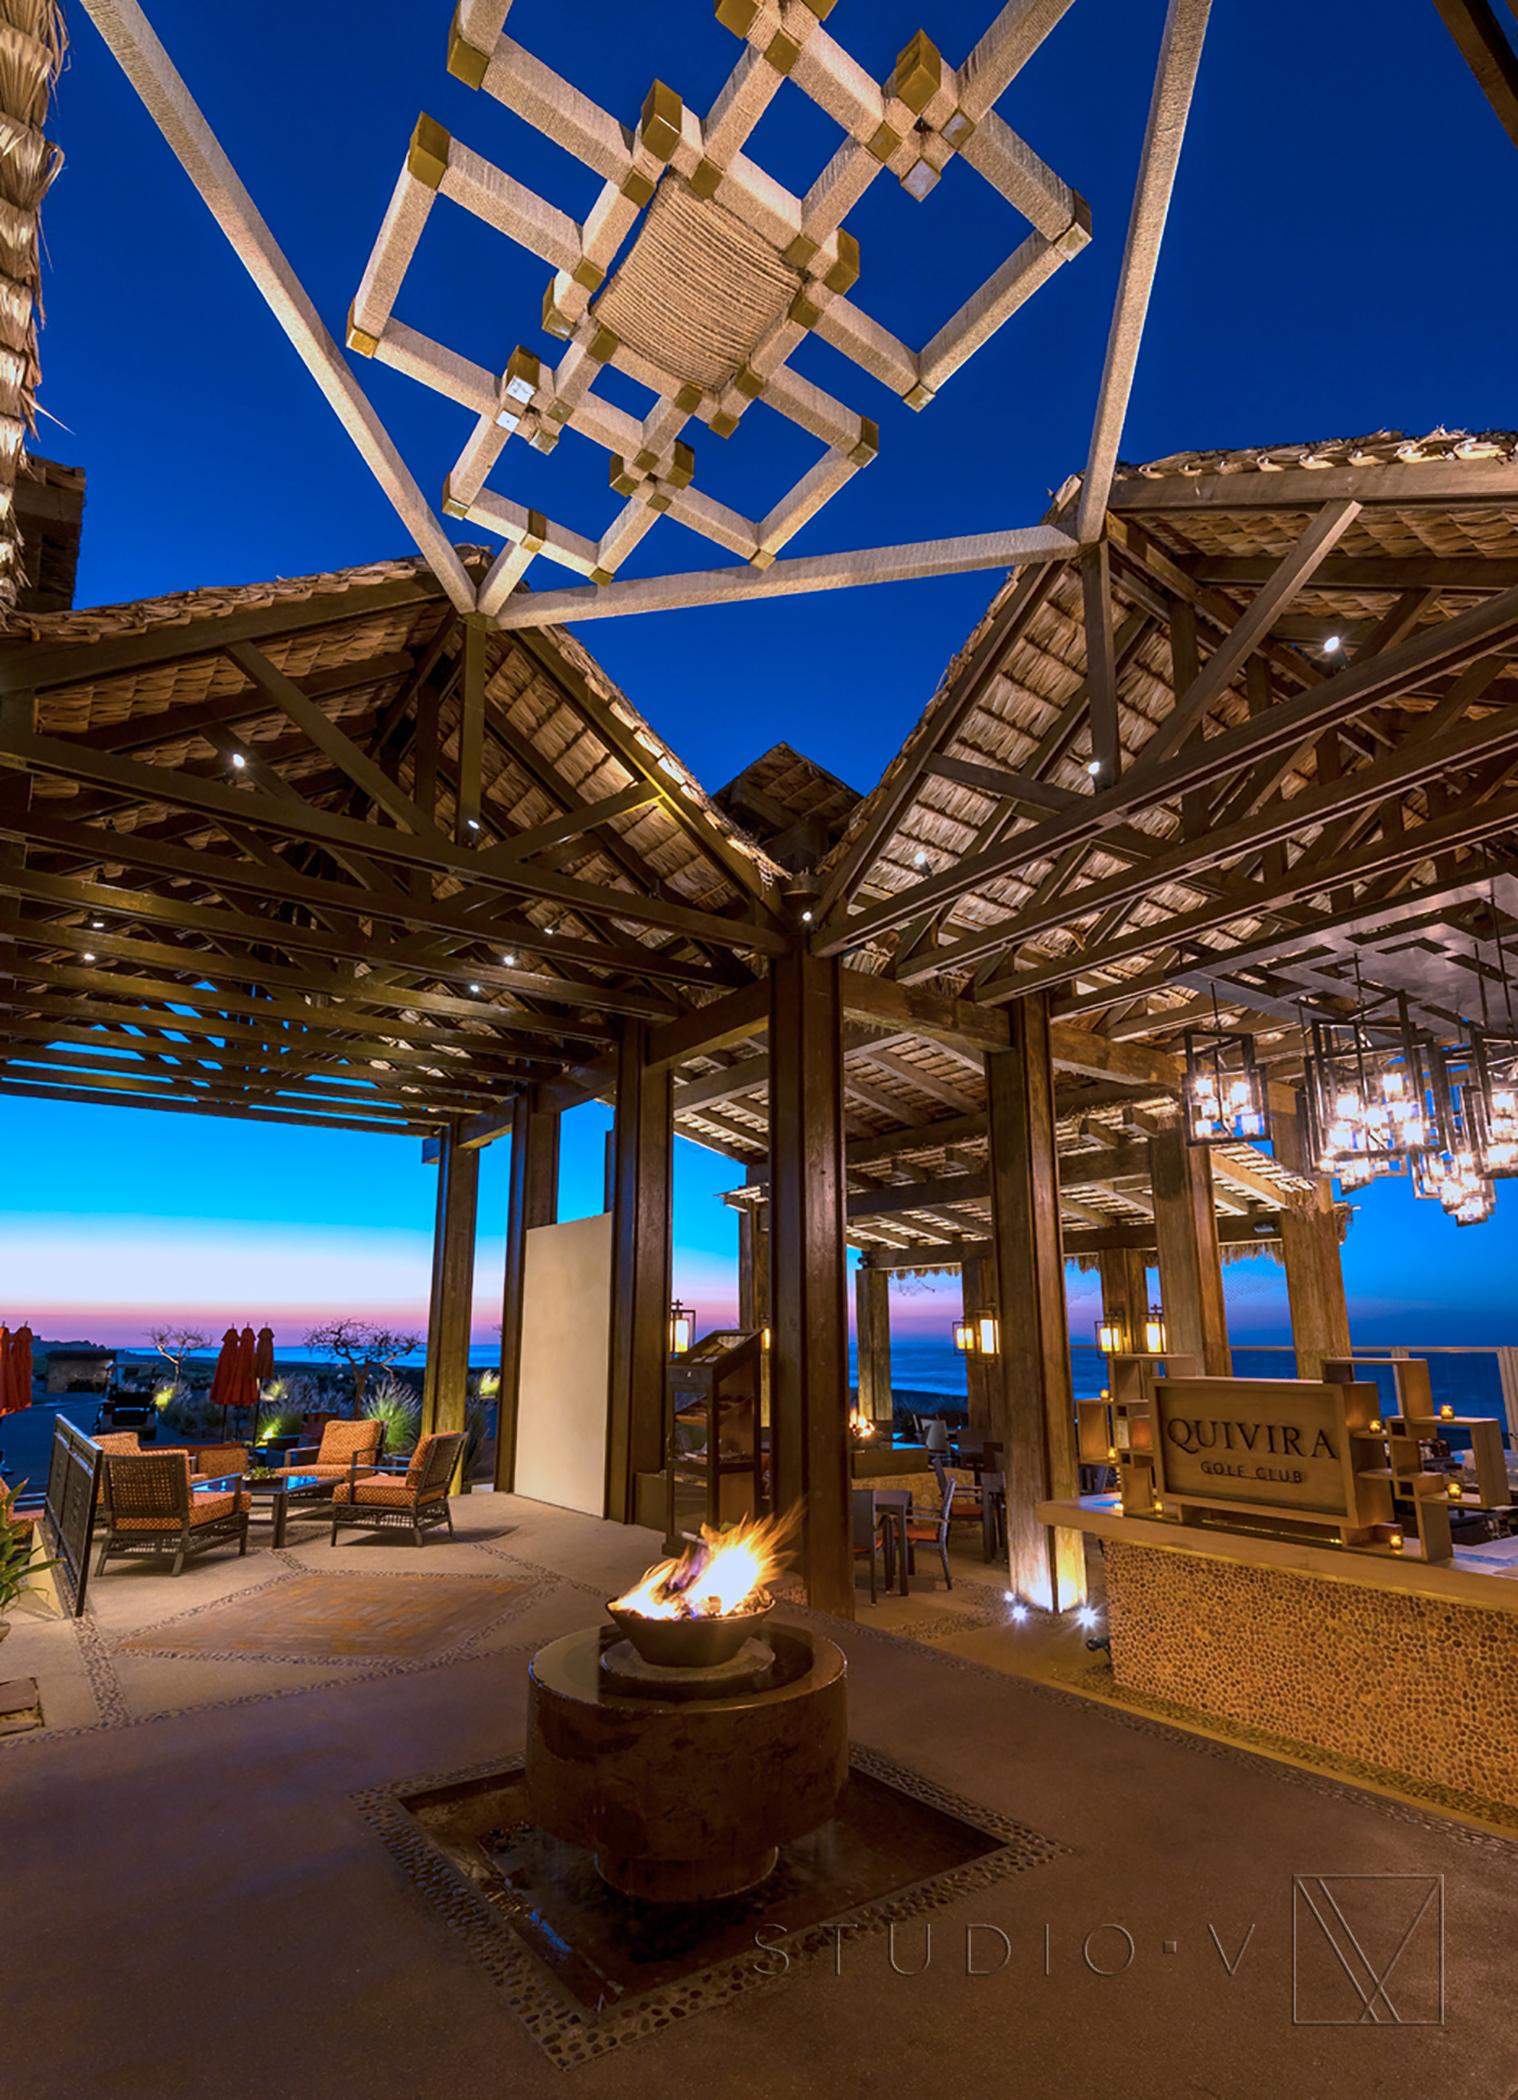 Quivira Clubhouse Sunset Beach Cabo San Lucas Studio V Interior Architecture and Design Scottsdale Arizona AZ (5).jpg